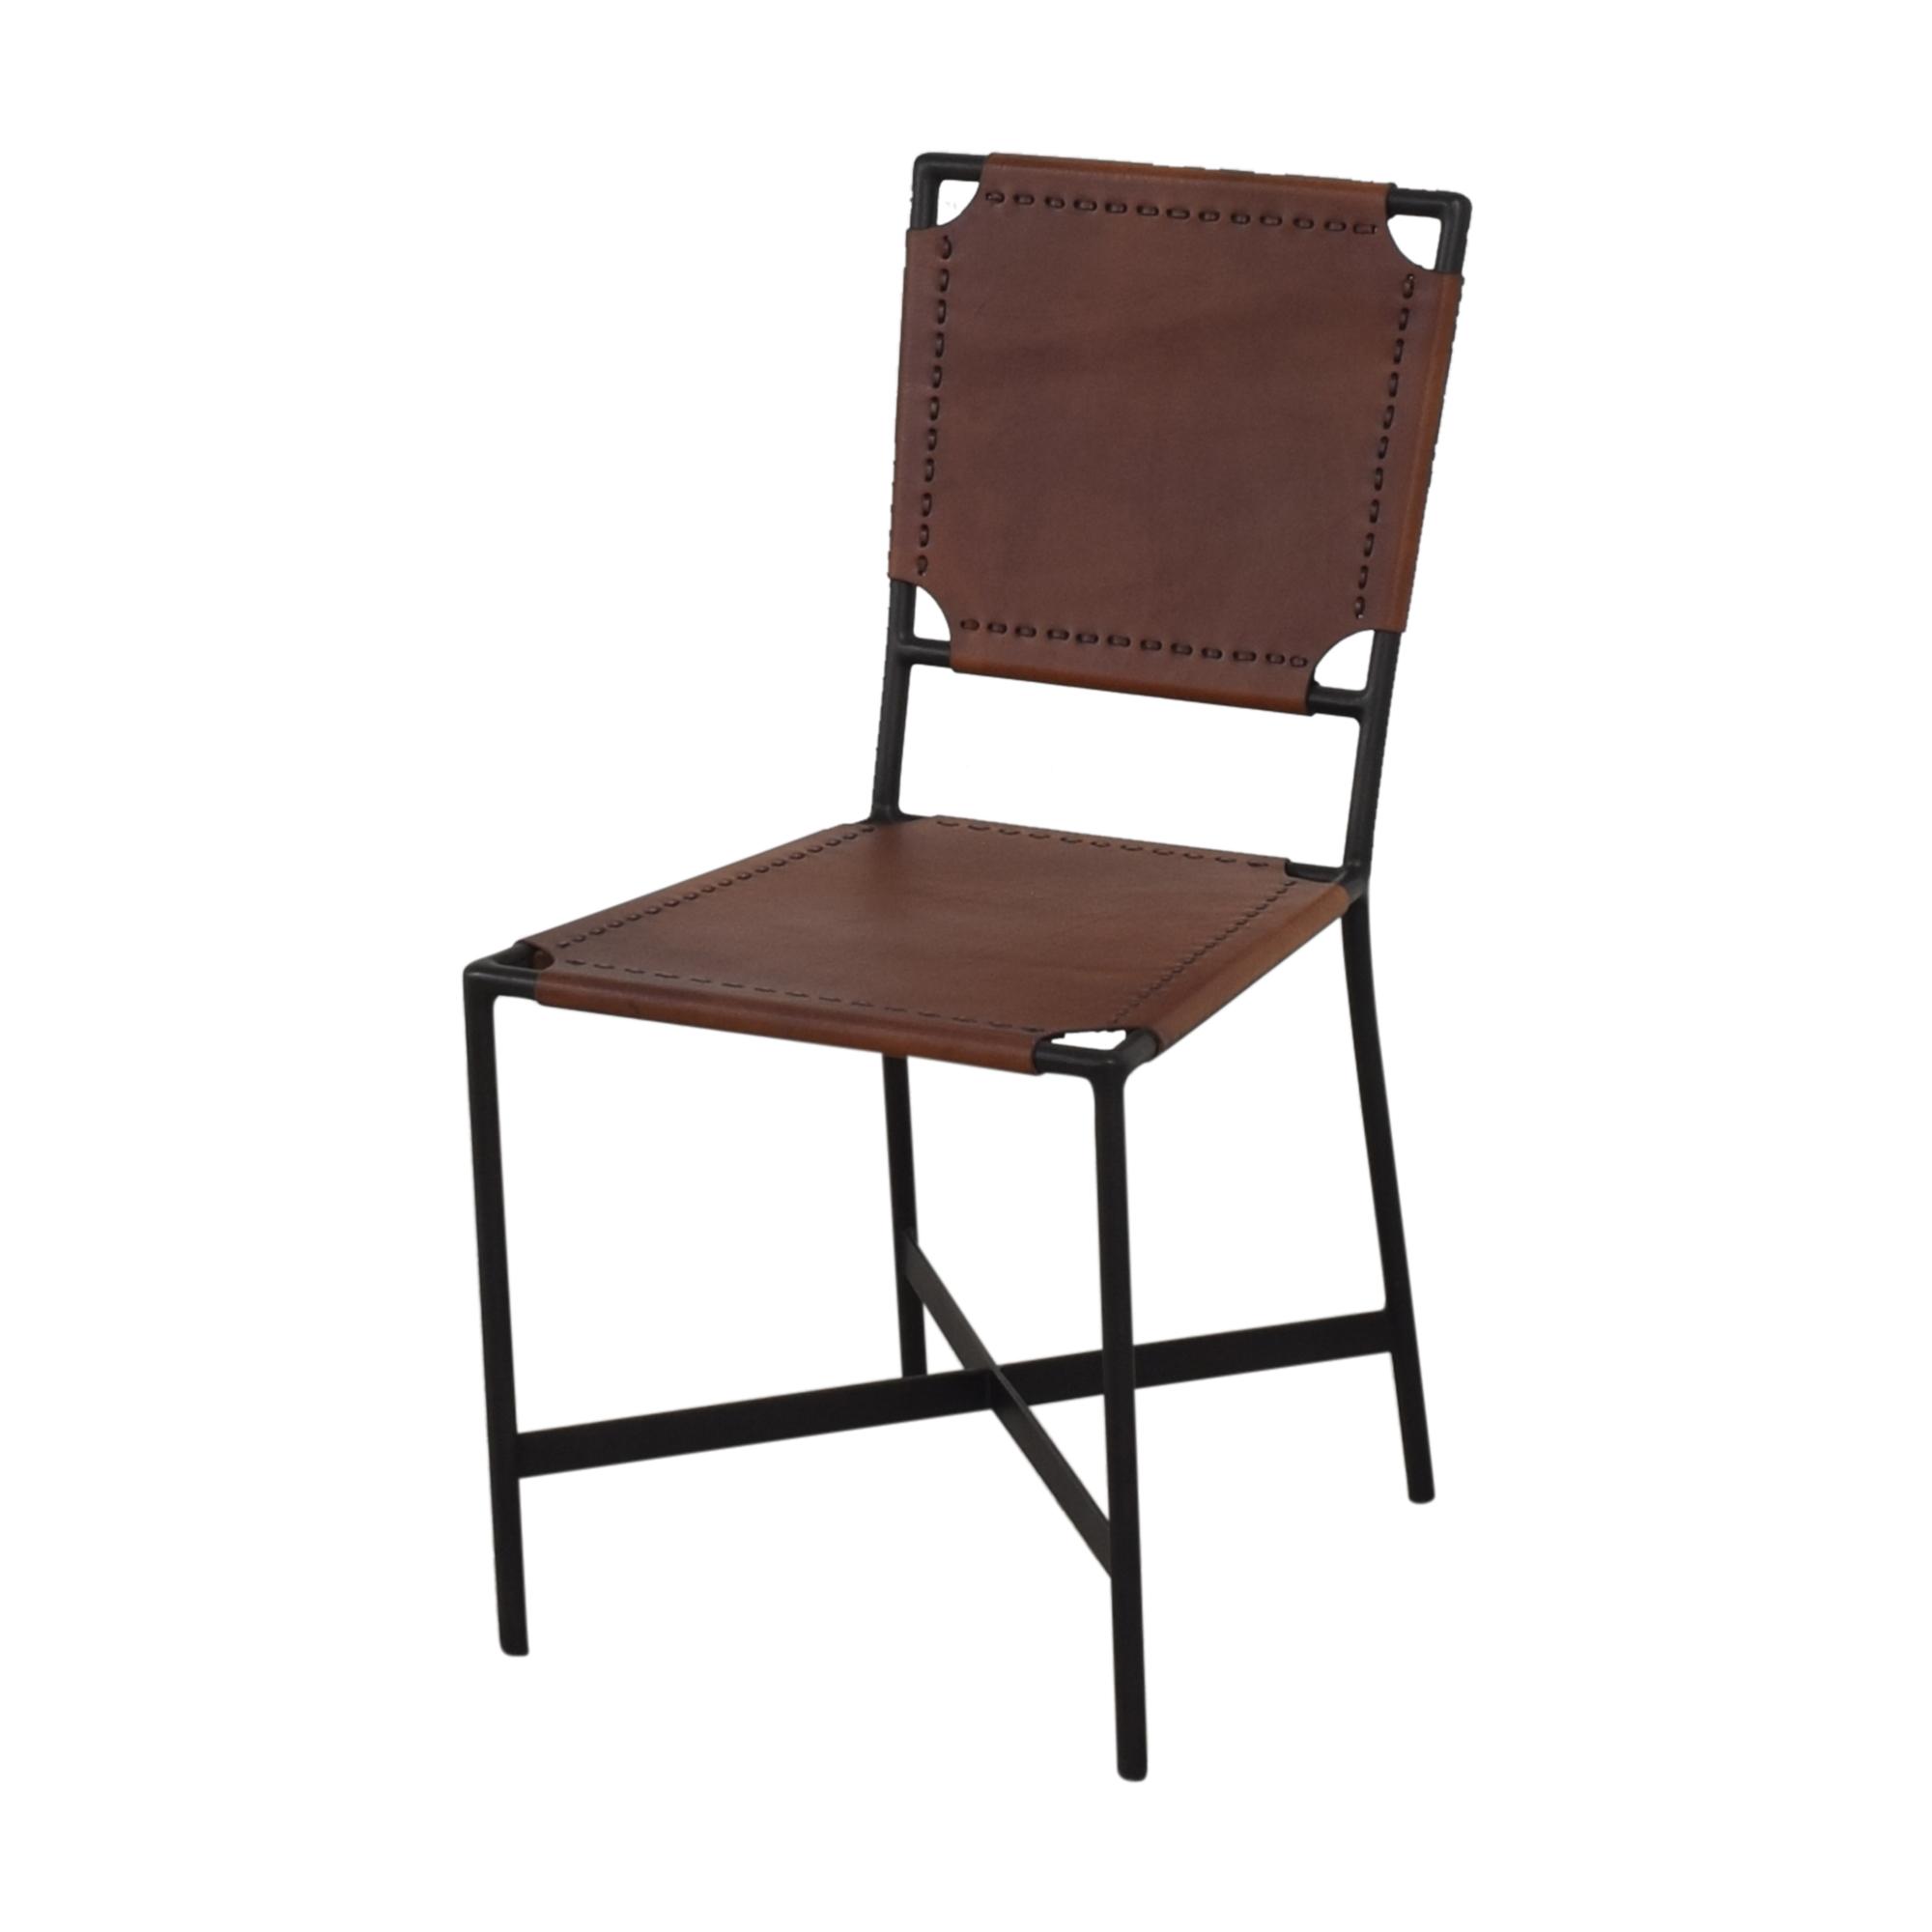 Crate & Barrel Crate & Barrel Laredo Dining Chairs dimensions